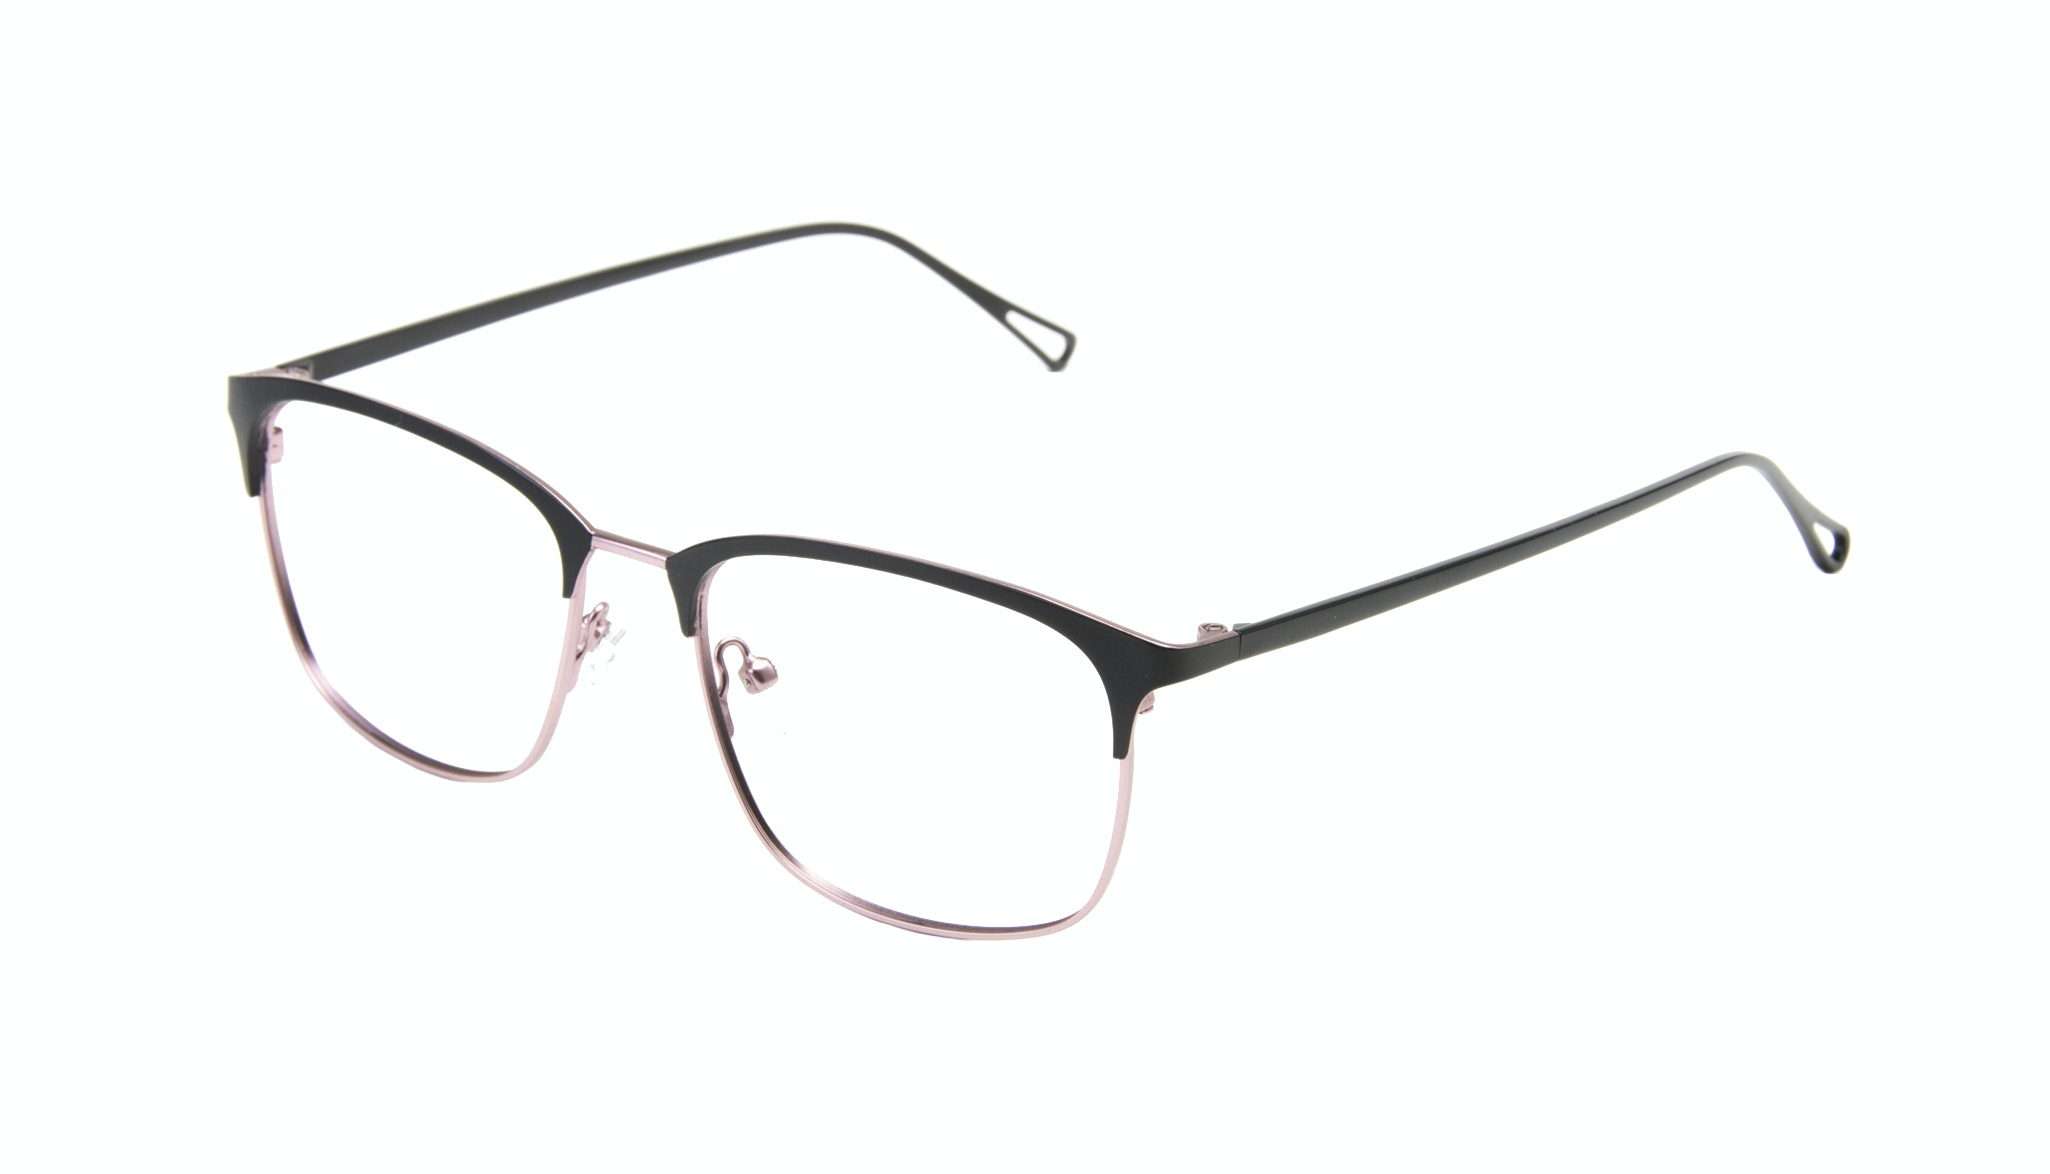 Affordable Fashion Glasses Rectangle Eyeglasses Women Seaside Deep Silver Tilt